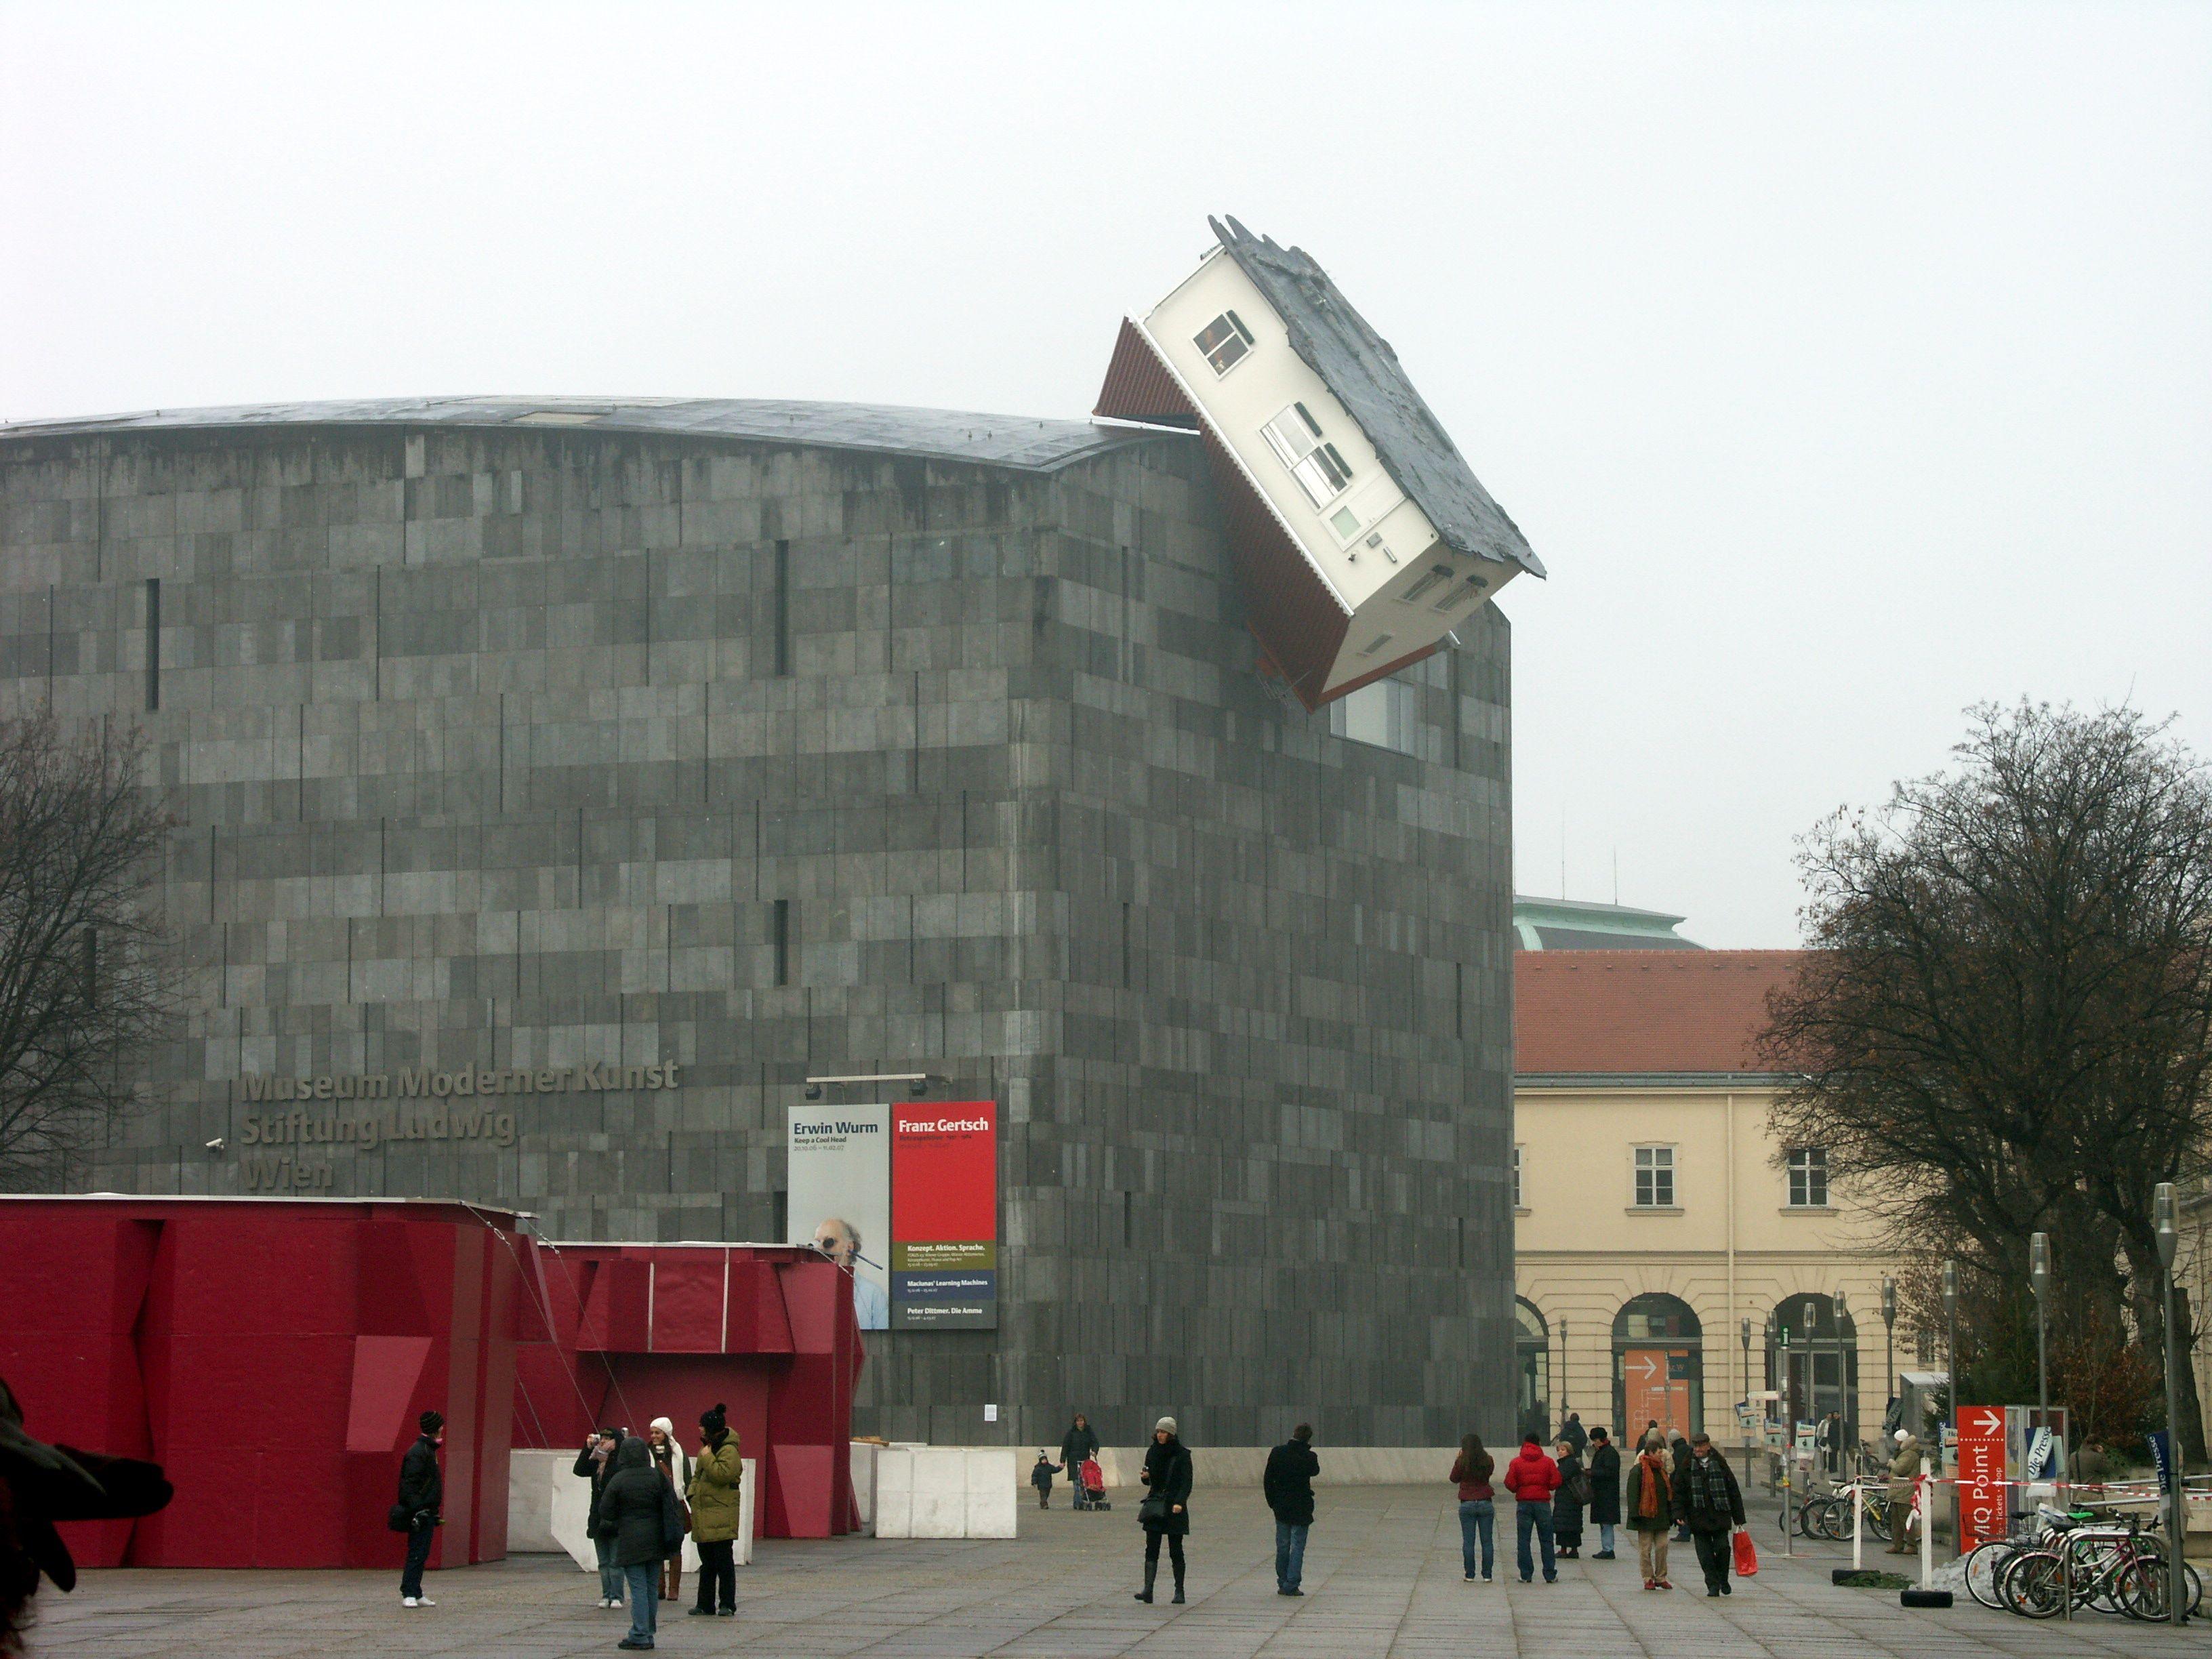 Erwin Wurm Austria B 1954 House Attack 2006 House At The Upper External Side Of The Building Of Museum Moderner Ku Erwin Wurm Conceptual Art Land Art